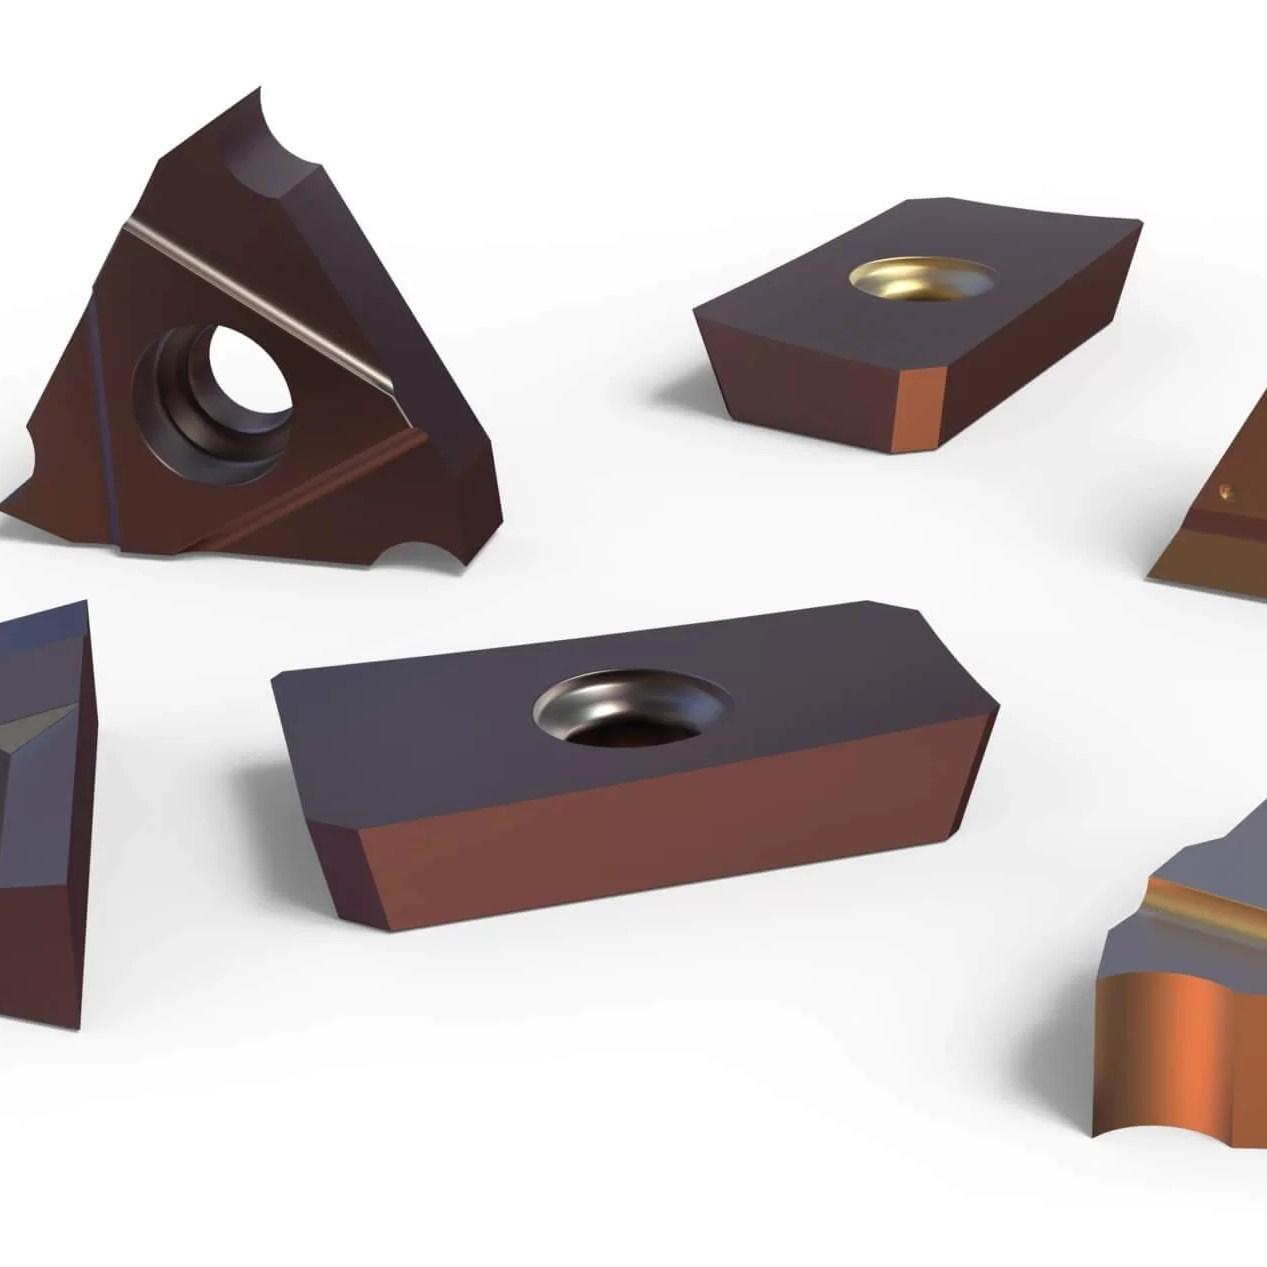 Precision Grinding Carbide Workpieces